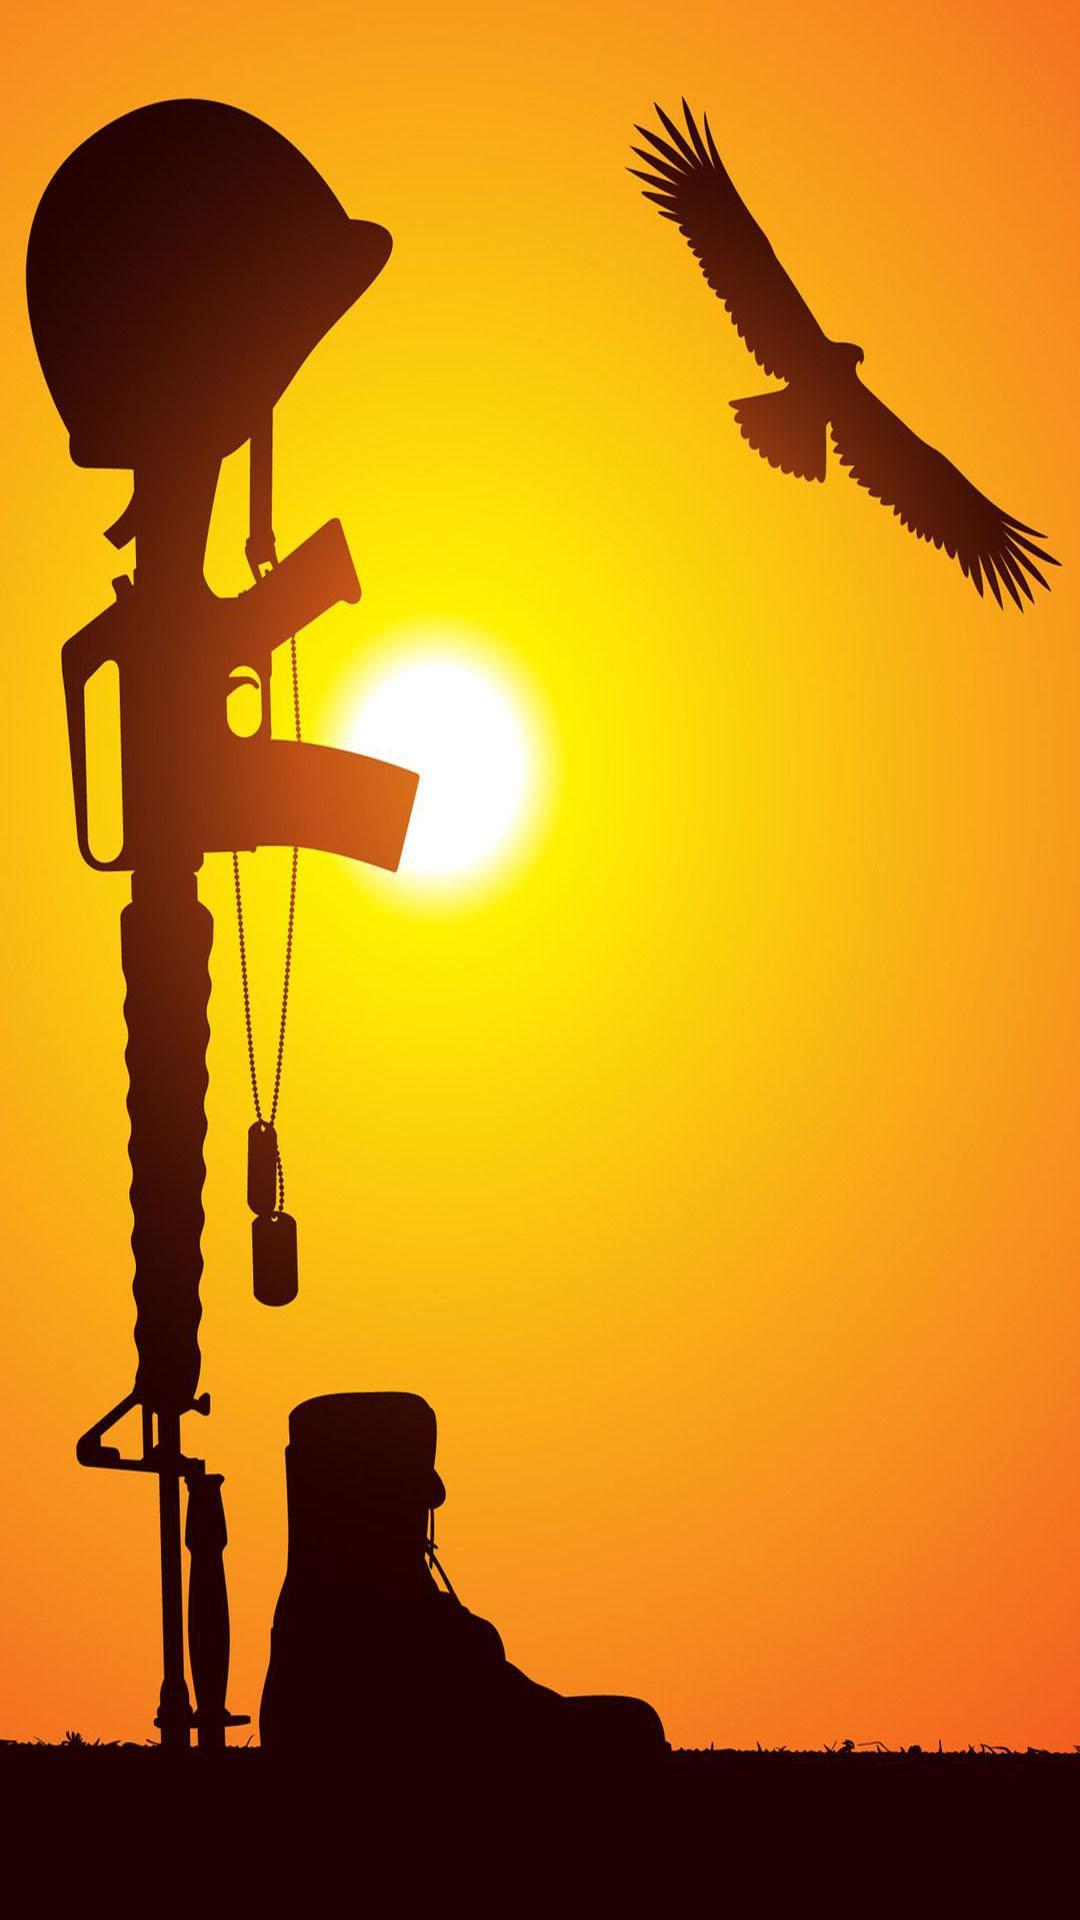 Indian Army Wallpaper Hd 1080x1920 Download Hd Wallpaper Wallpapertip